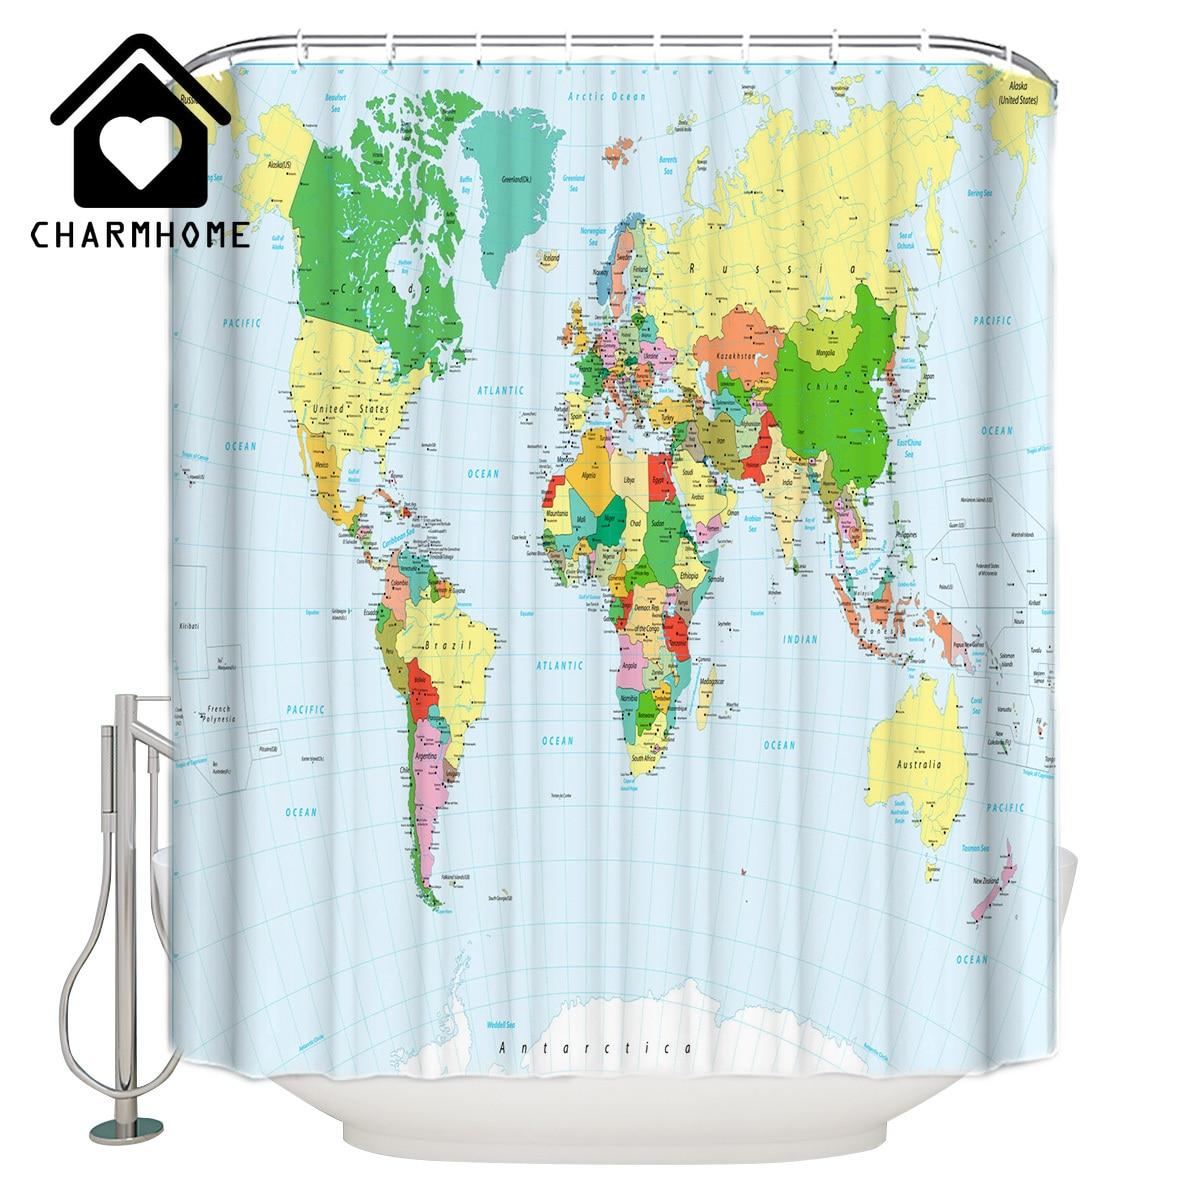 Mainstays World Map Peva Shower Curtain 1 Each Walmart Com